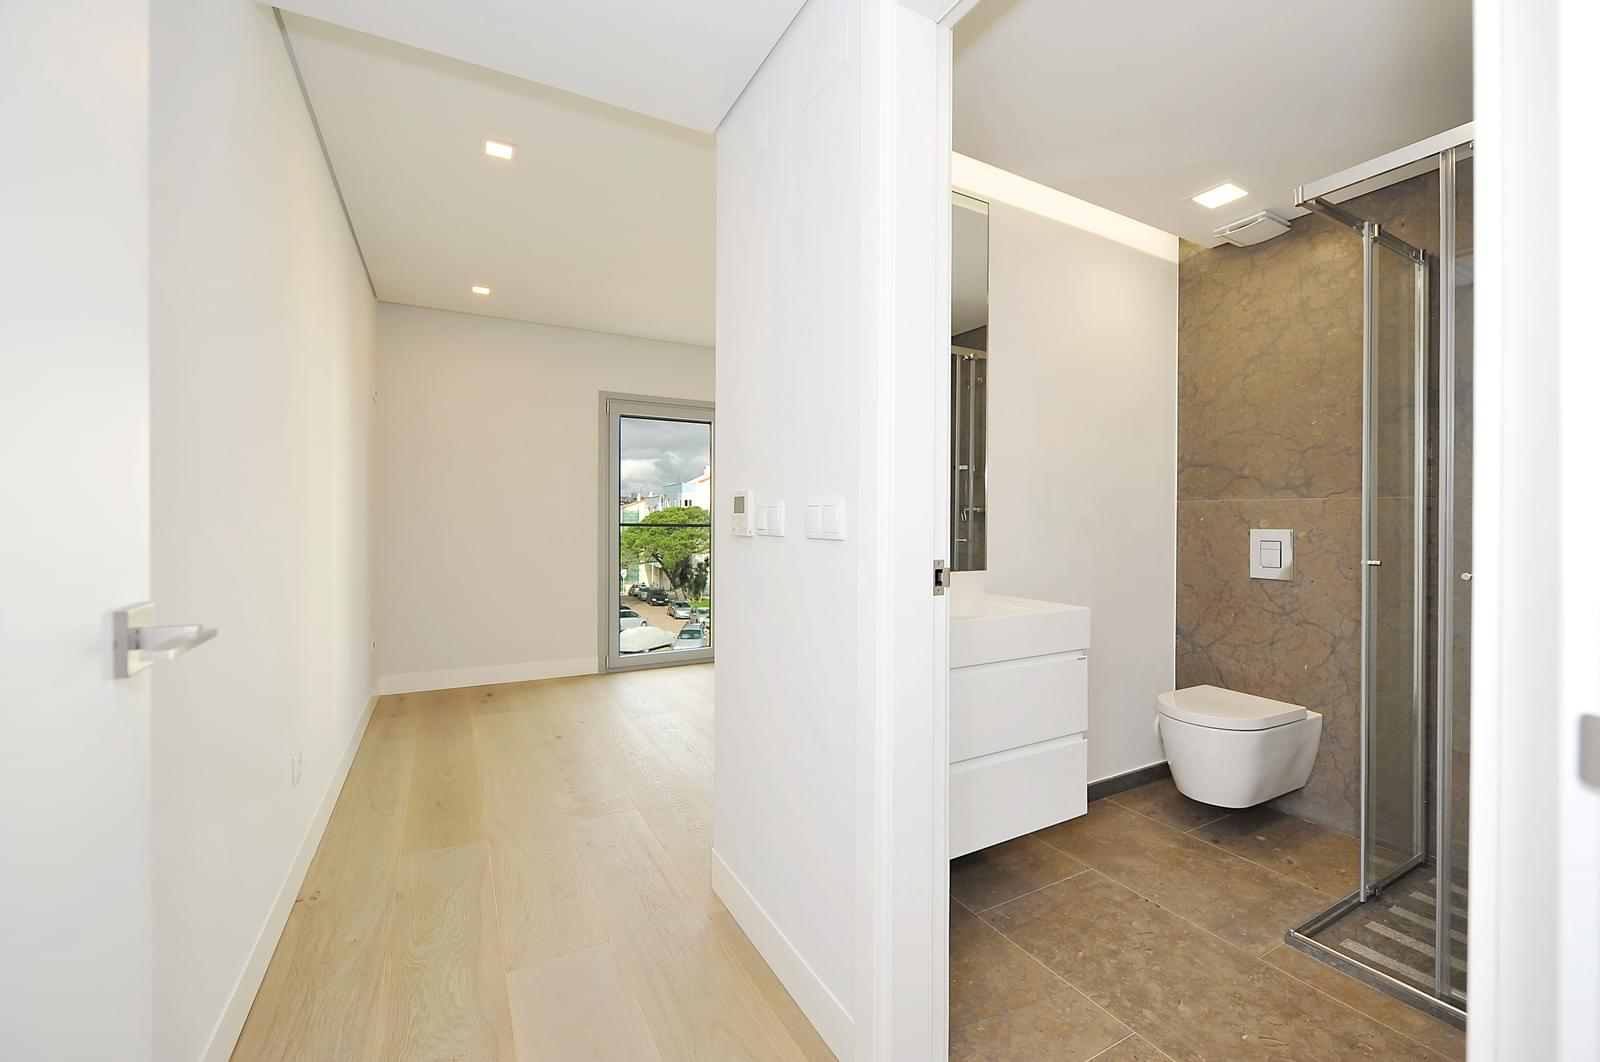 pf18989-apartamento-t4-oeiras-3104de0b-4942-4748-9674-7bff38fb91e0